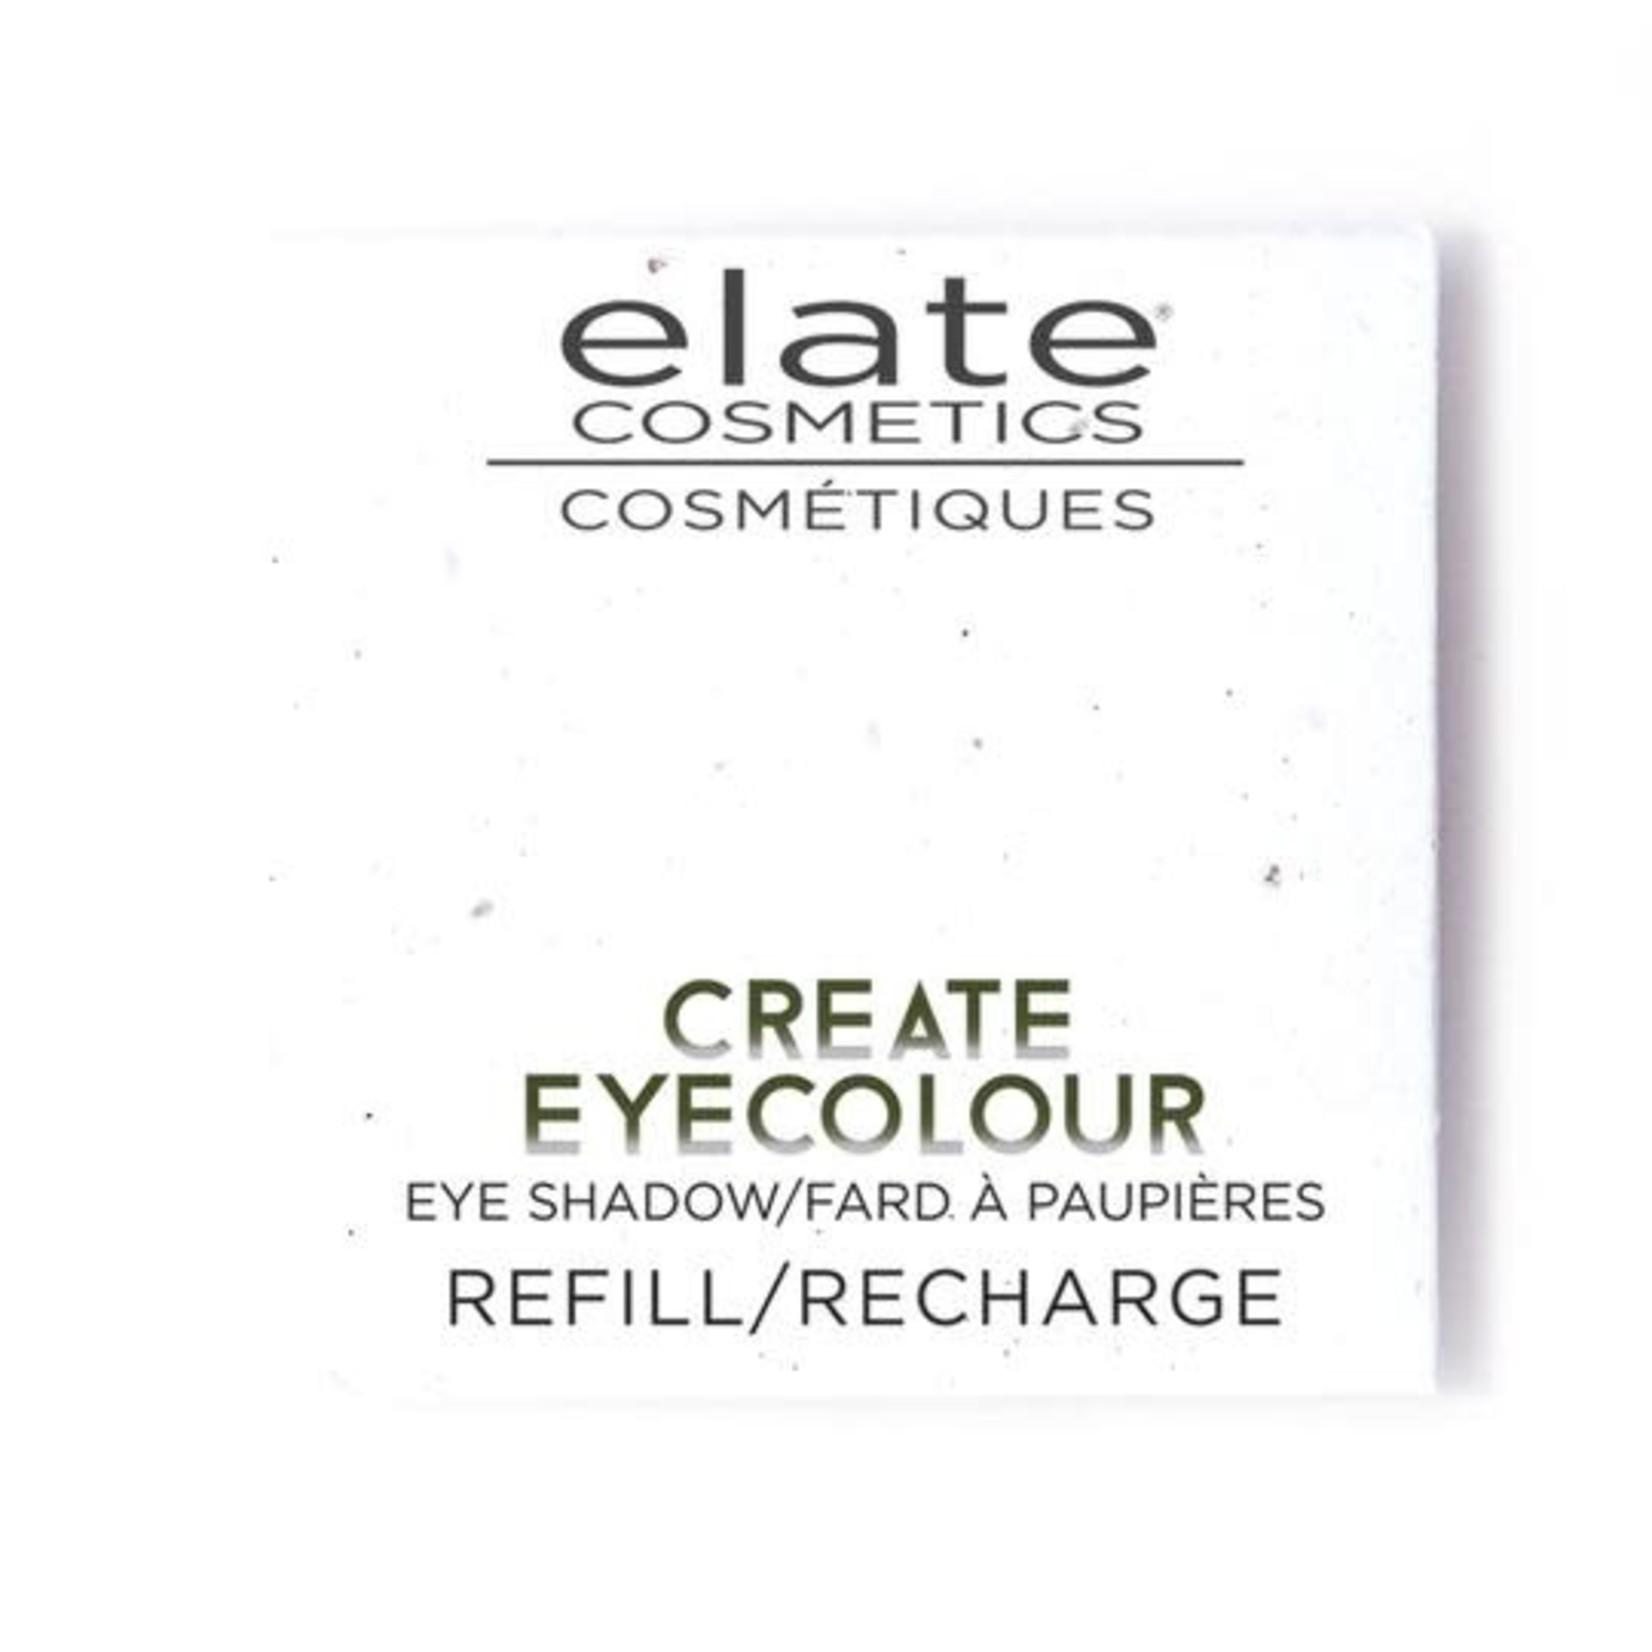 ELATE COSMETICS PRESSED EYECOLOUR - LUMEN